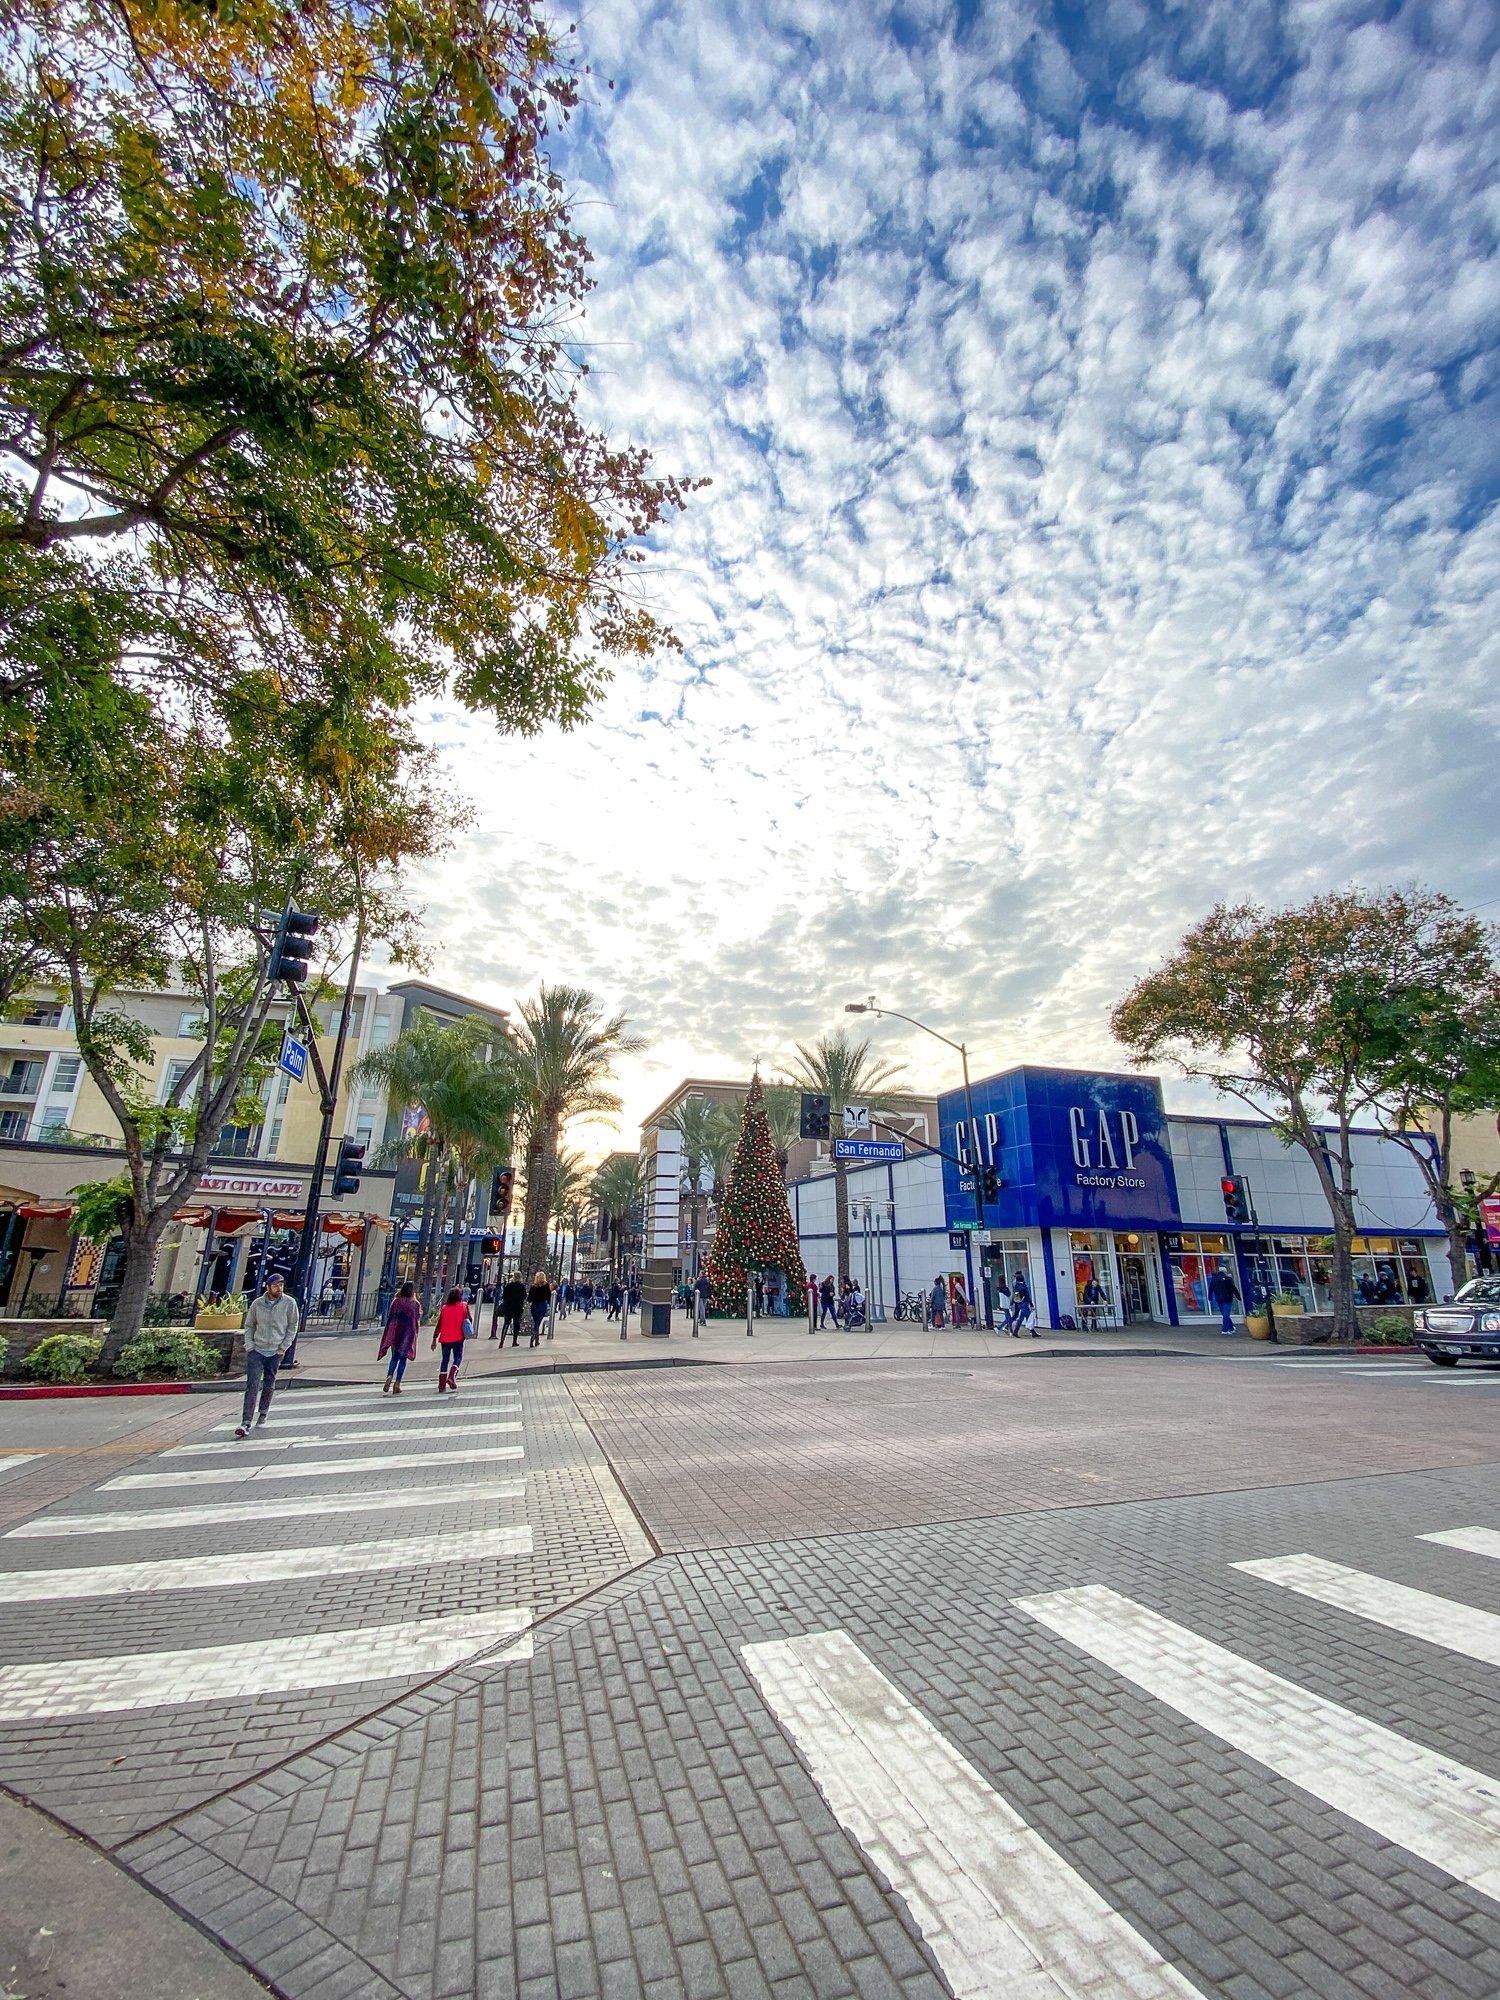 Downtown Burbank, California